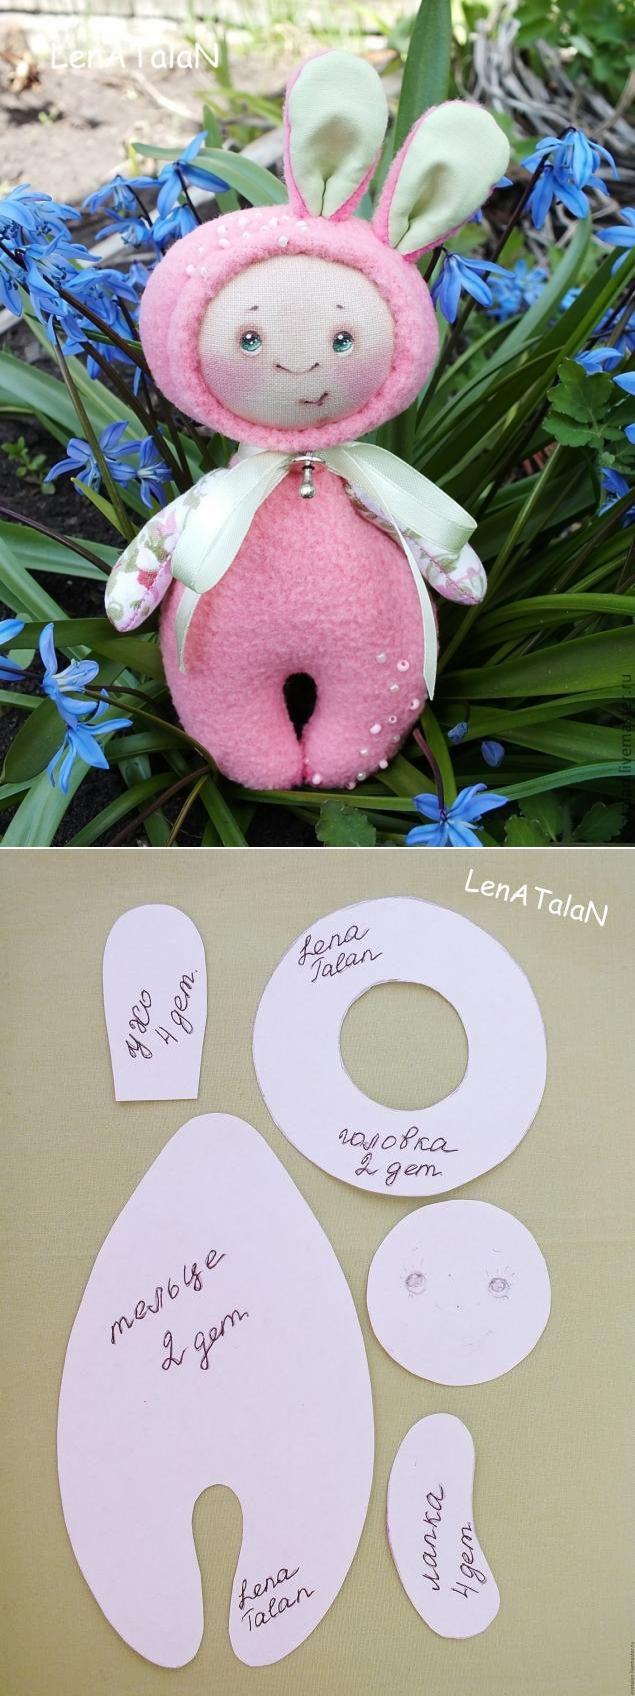 Cute Bunny Soft Toy: free pattern + tutorial / Шьем забавную зайку игрушку, выкройка